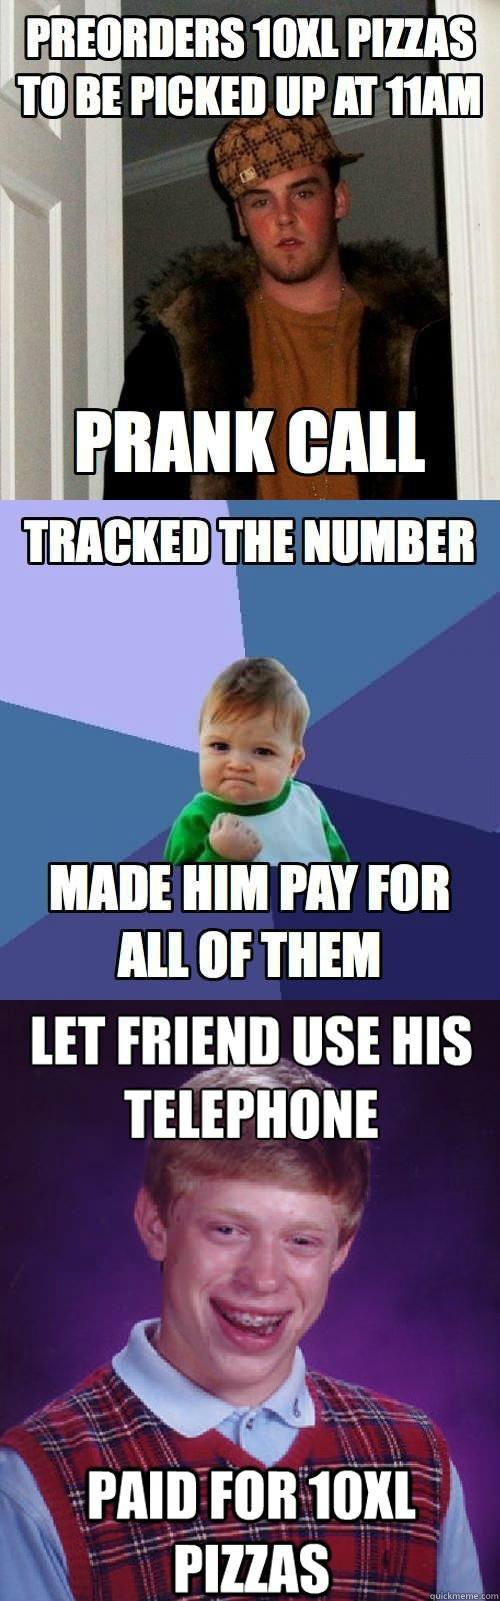 meme, scumbag steve, win kid, prank call, pizza, bad luck brian